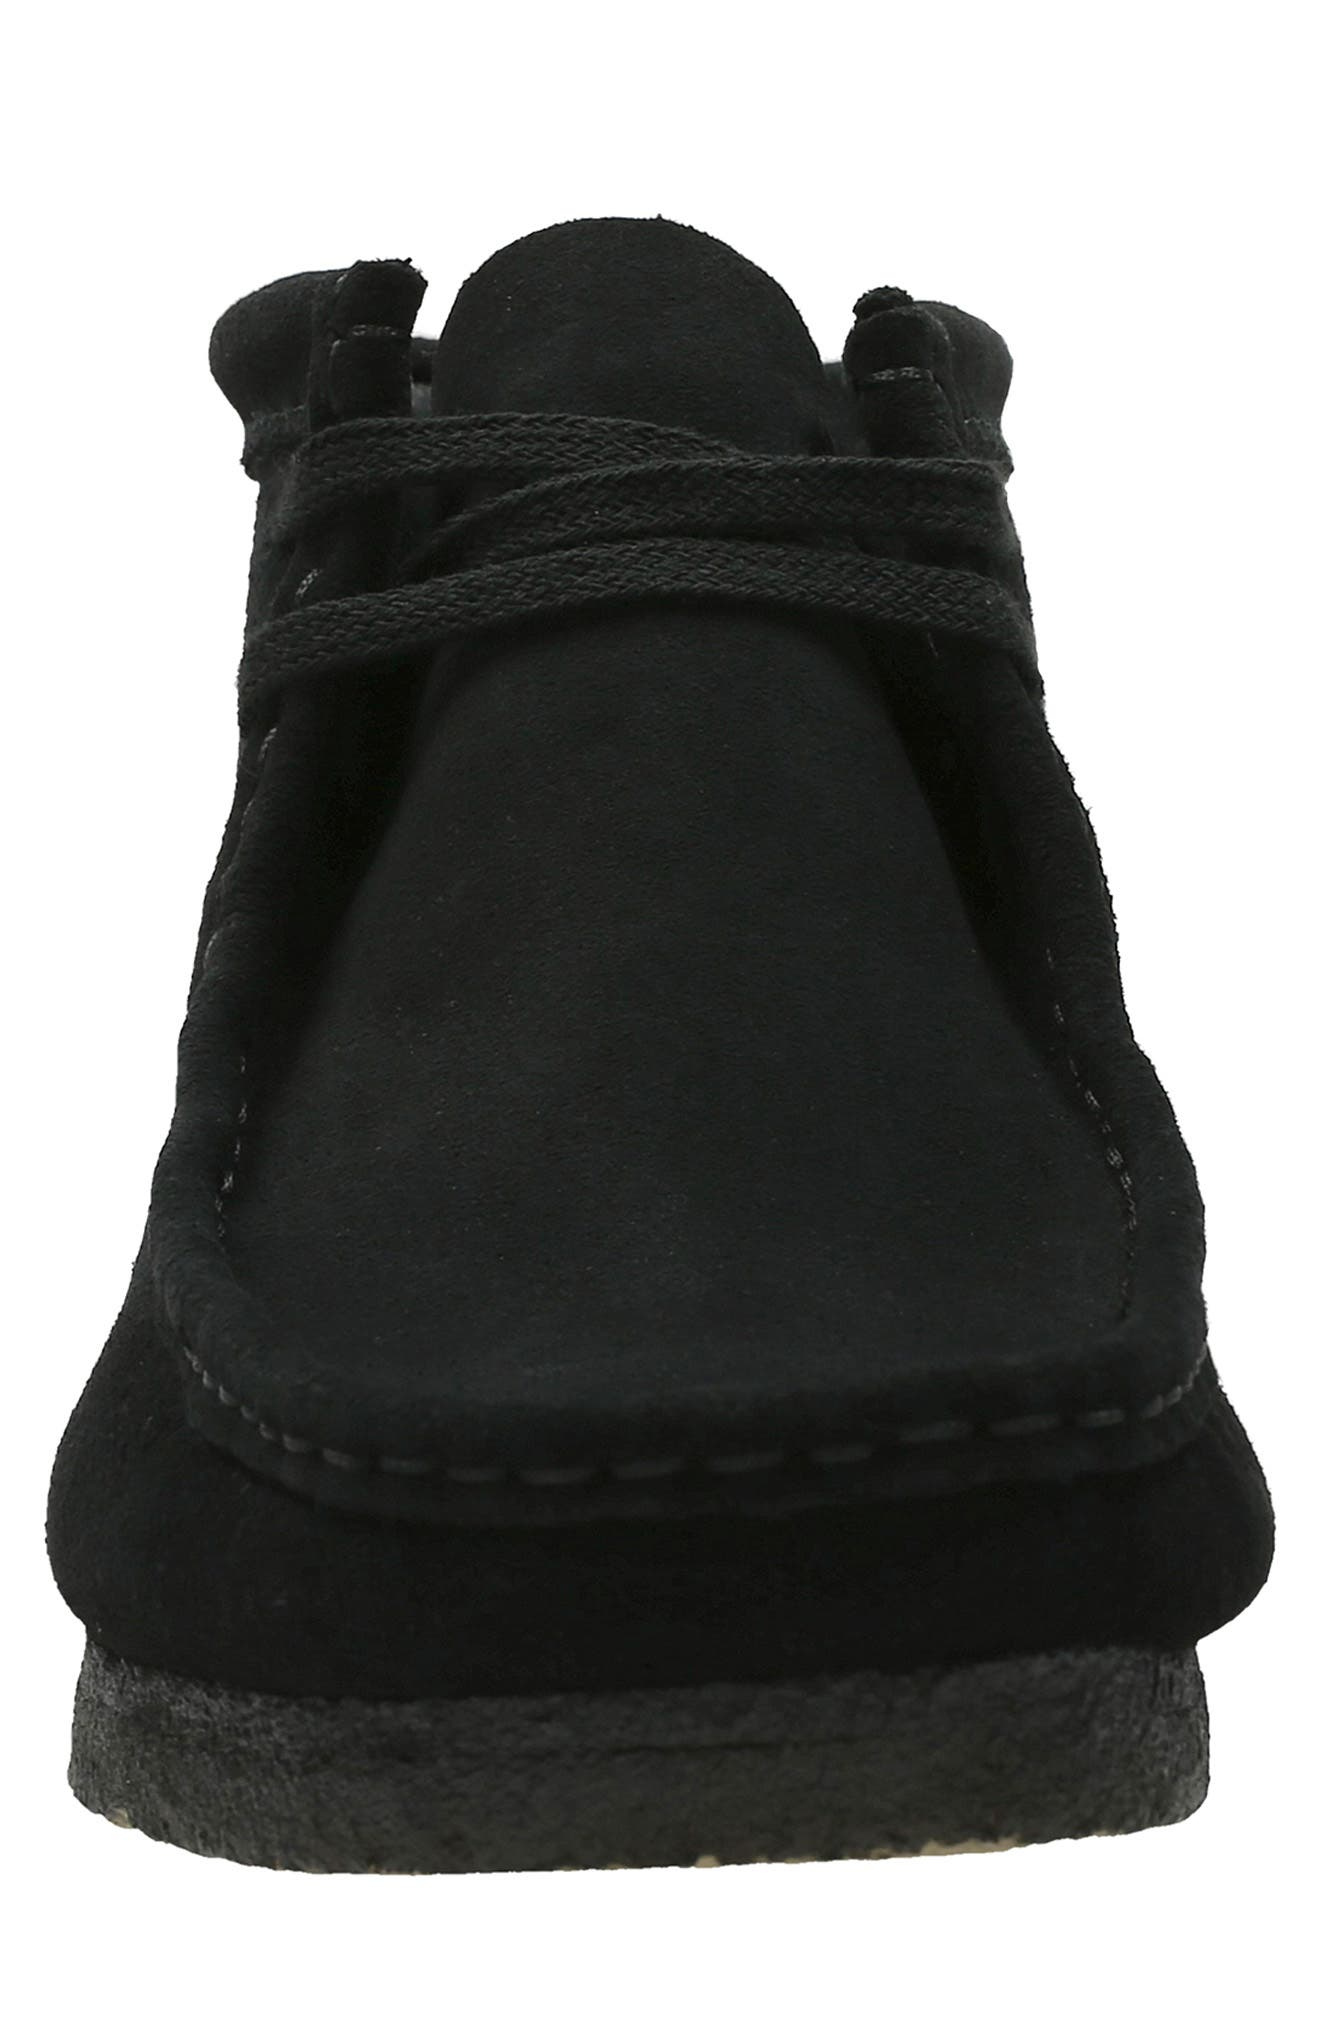 CLARKS<SUP>®</SUP>, Originals Wallabee Boot, Alternate thumbnail 3, color, BLACK SUEDE